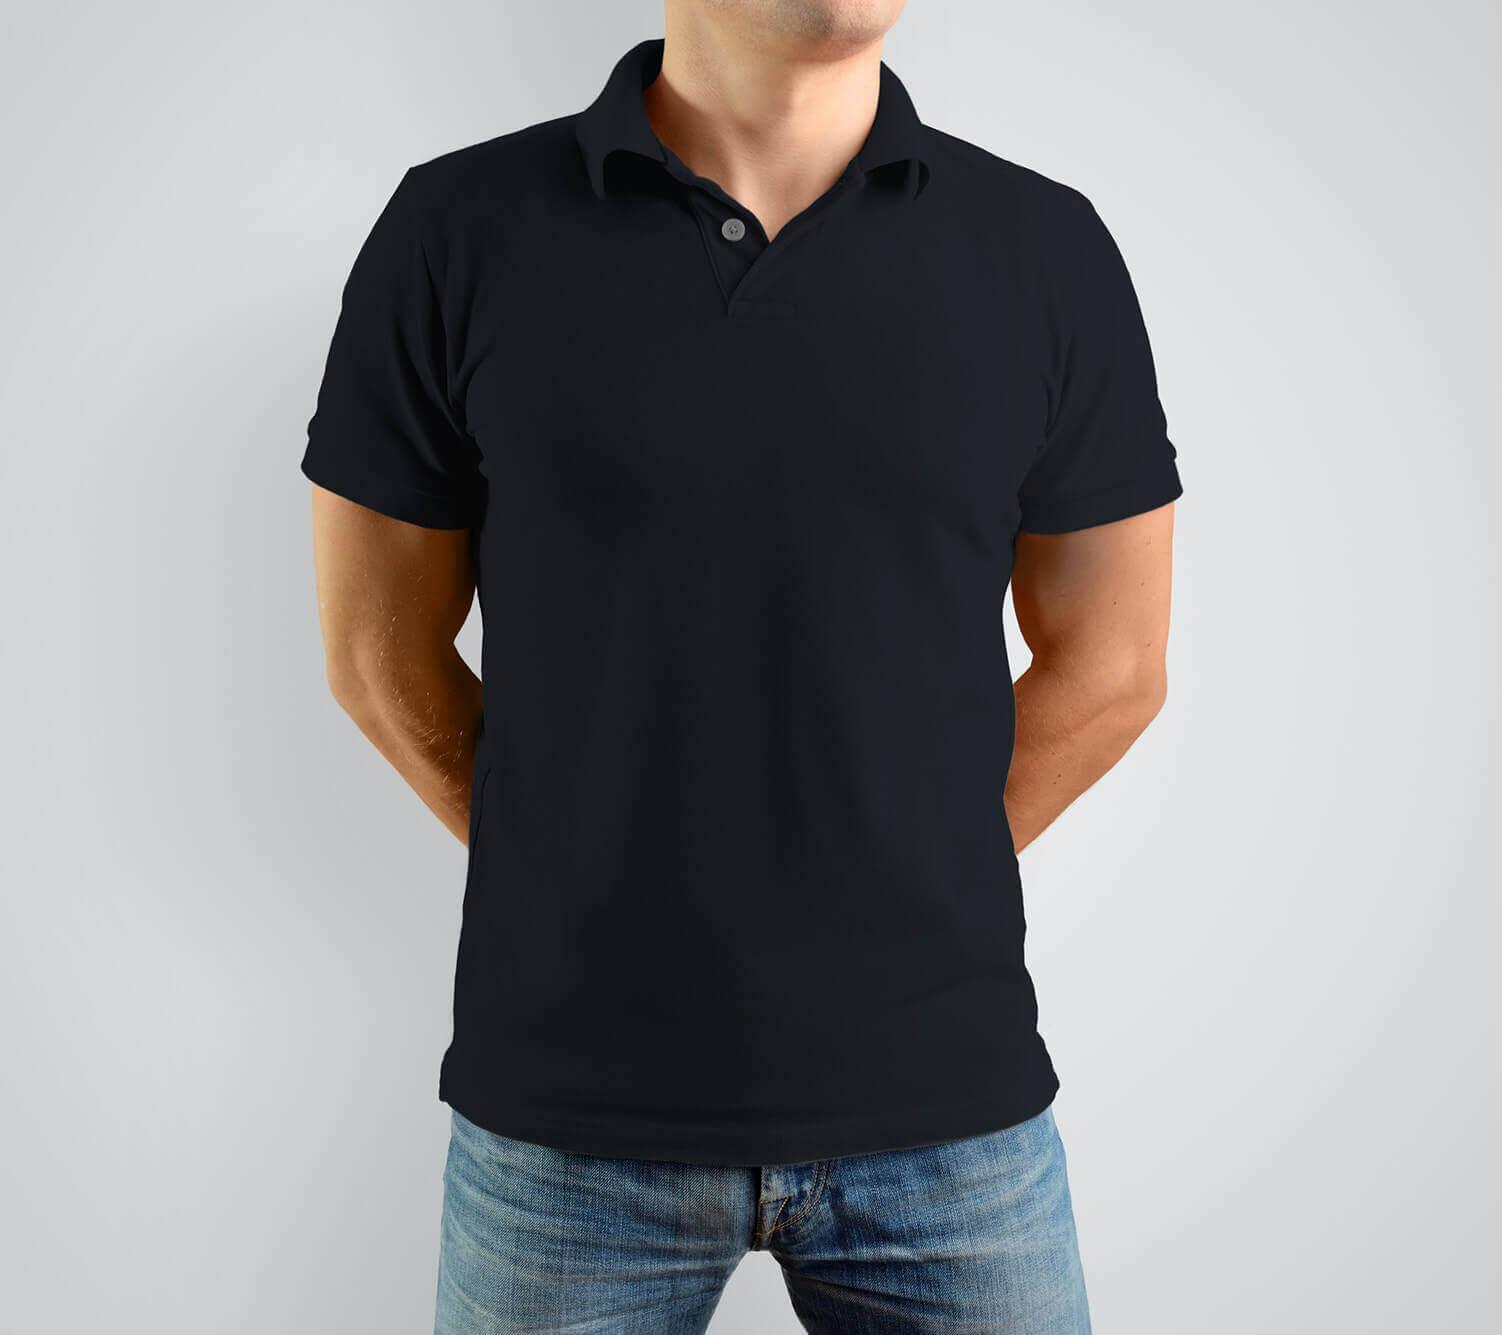 Polo T-shirt Design Software